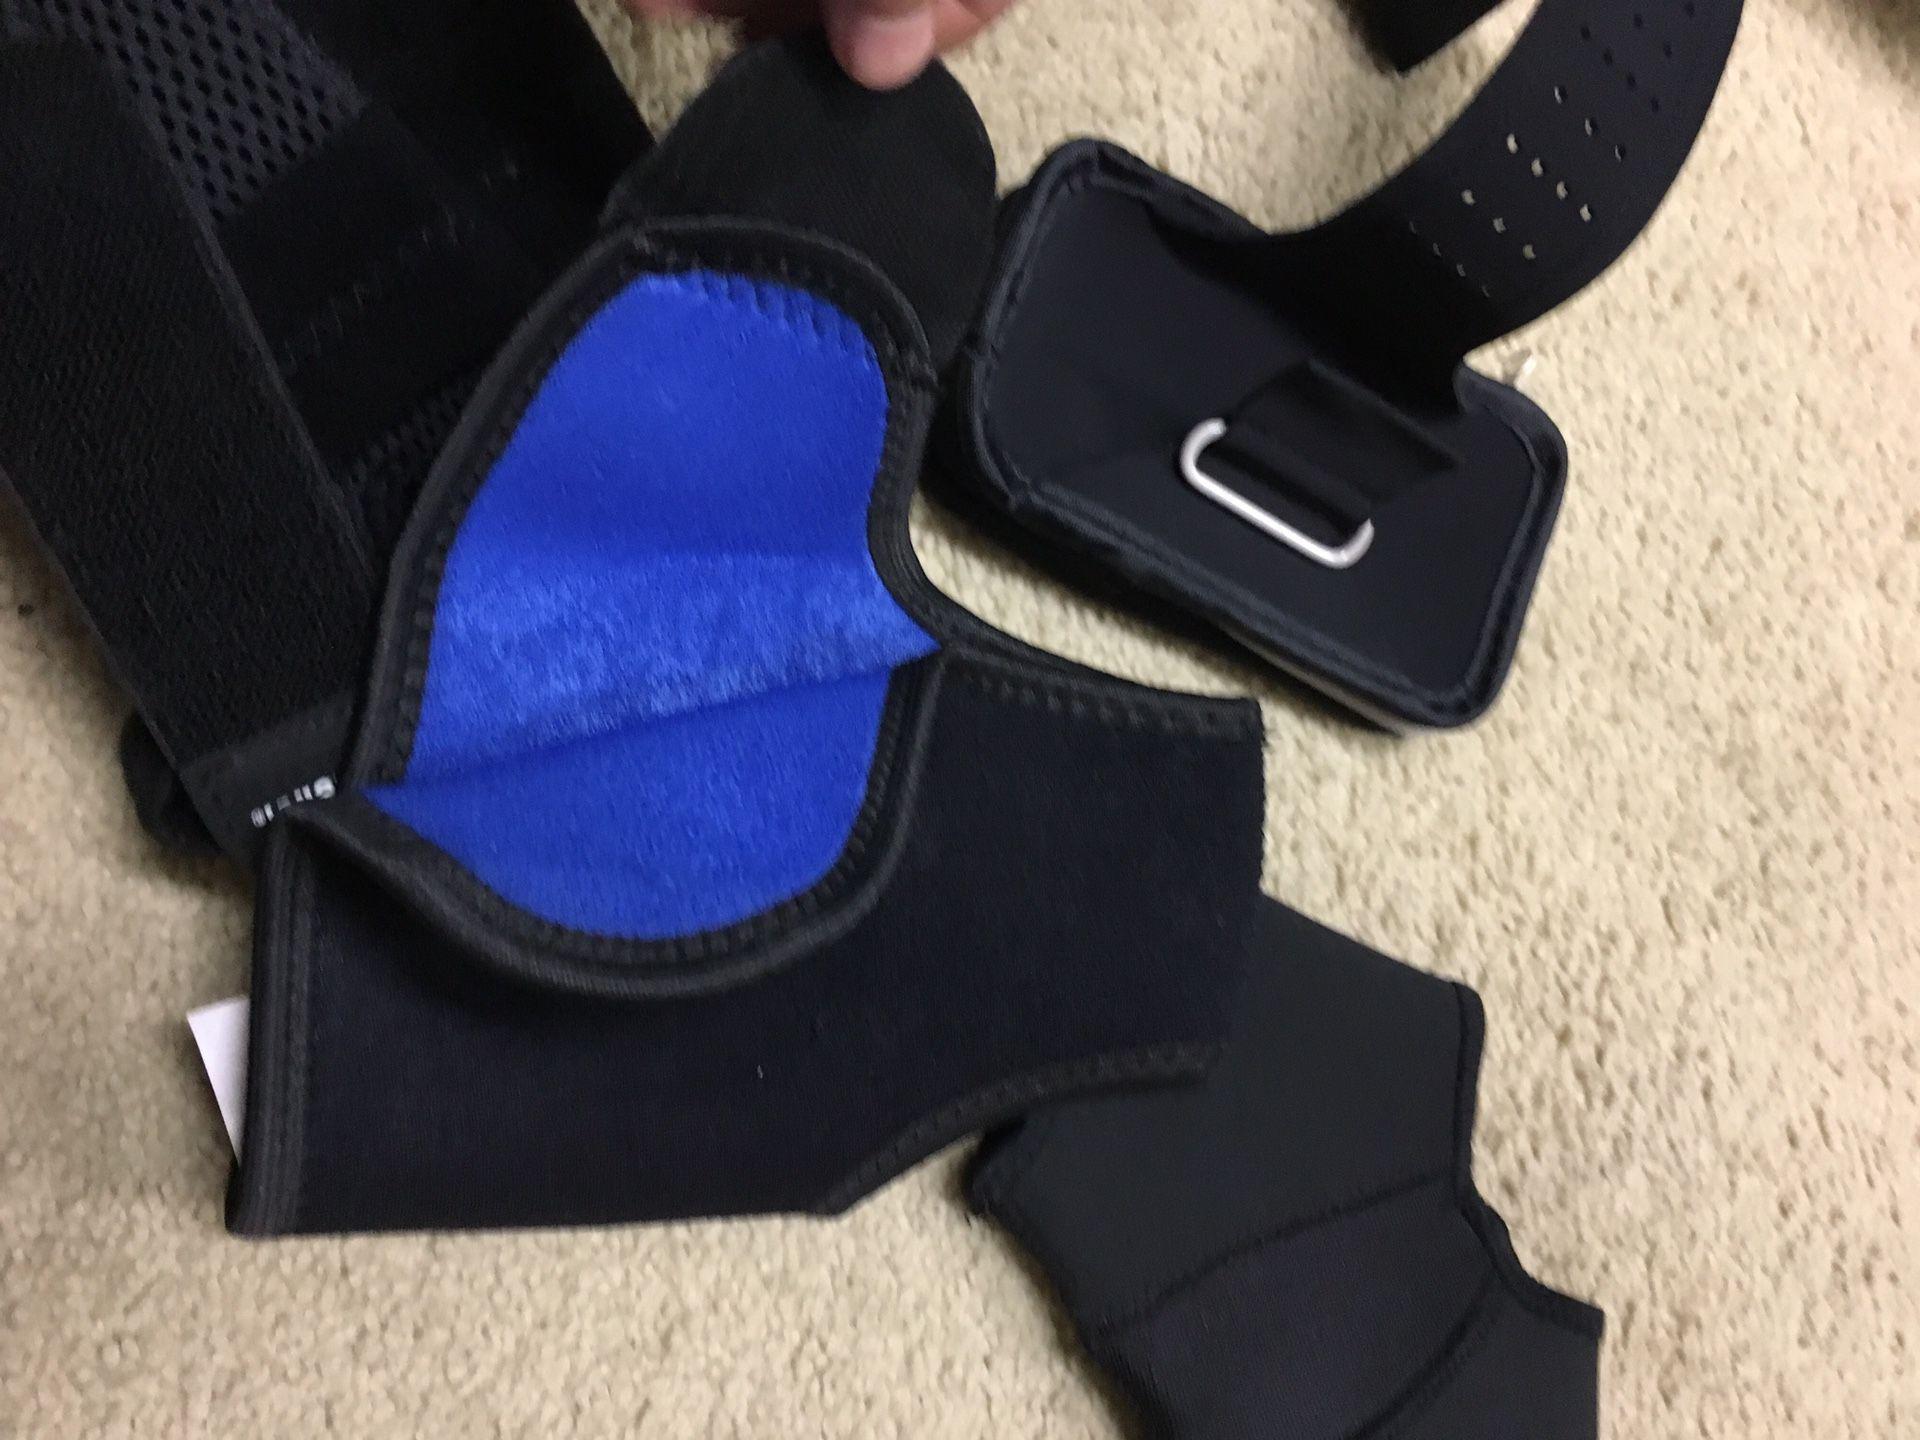 Ankle and wrist brace